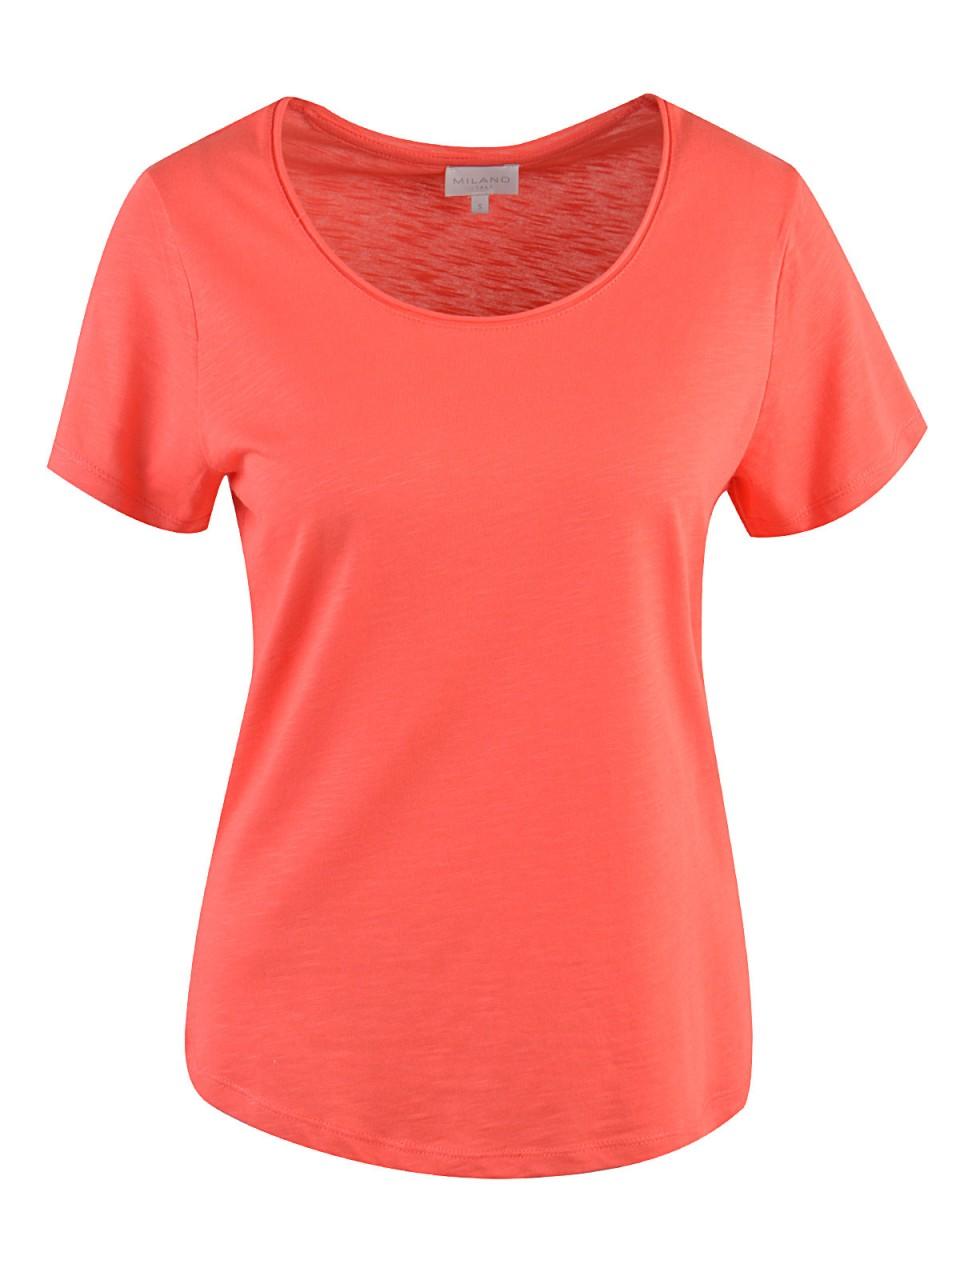 milano-italy-damen-t-shirt-orange